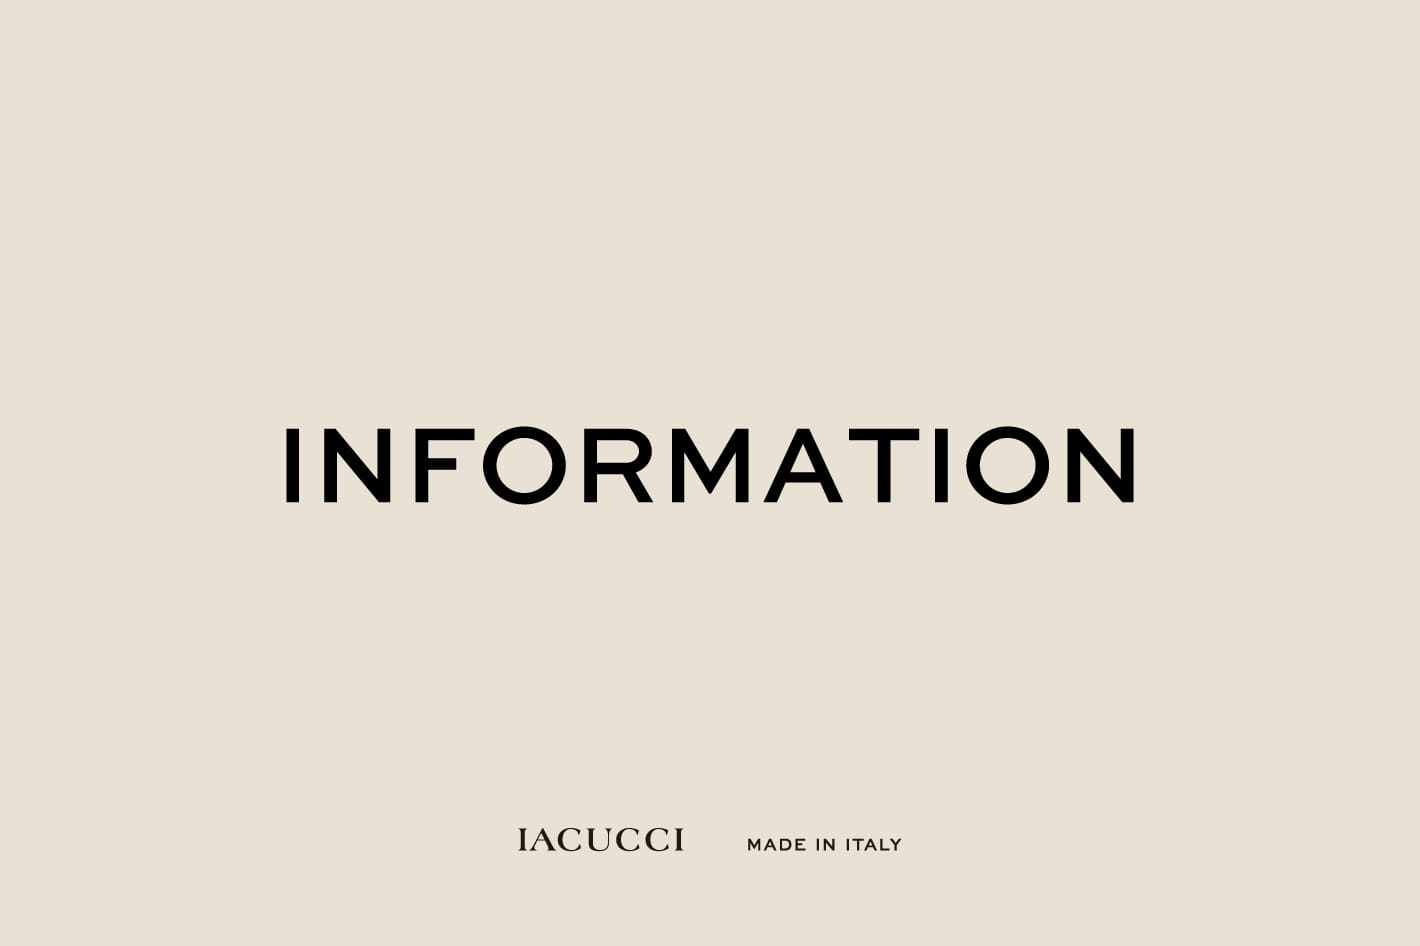 IACUCCI IACUCCIを騙った悪質な模倣品にご注意ください